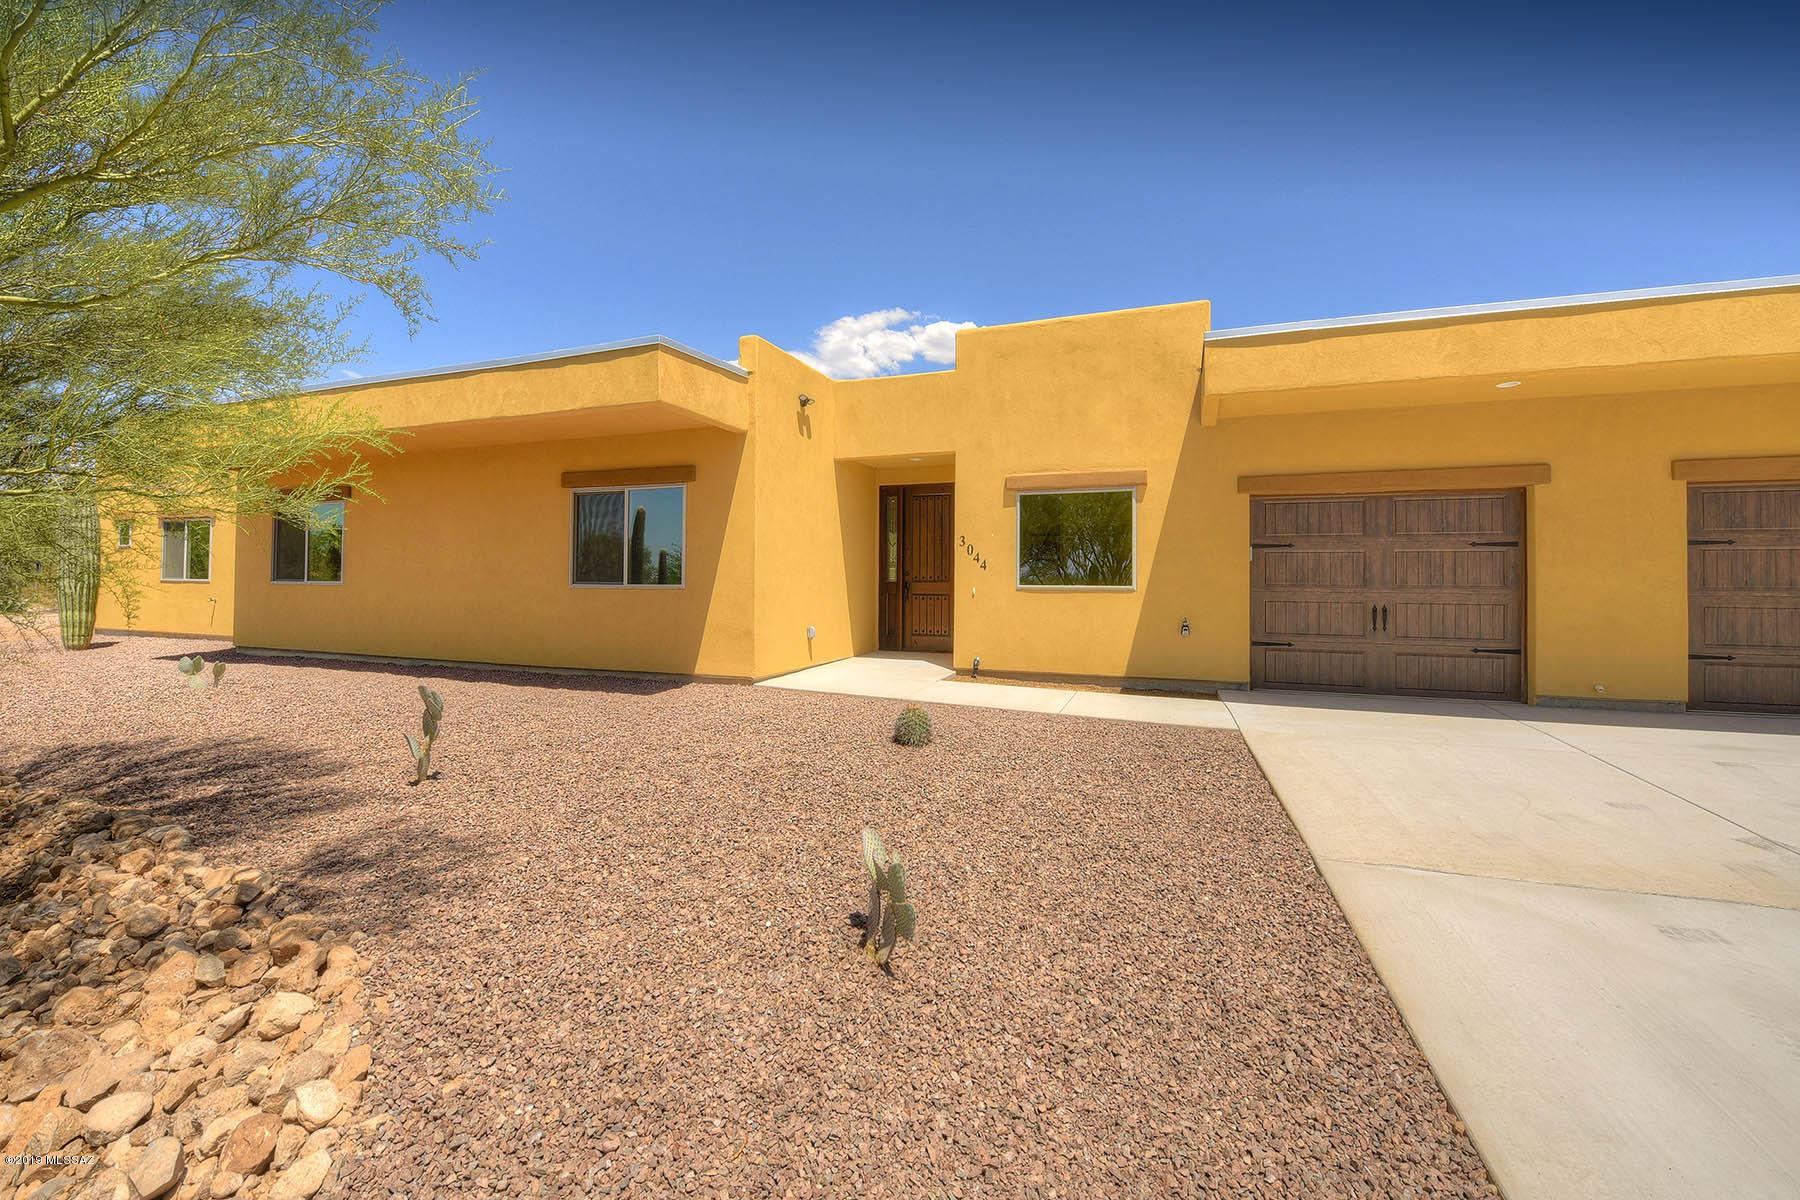 Photo of 3044 N Soldier Trail, Tucson, AZ 85749